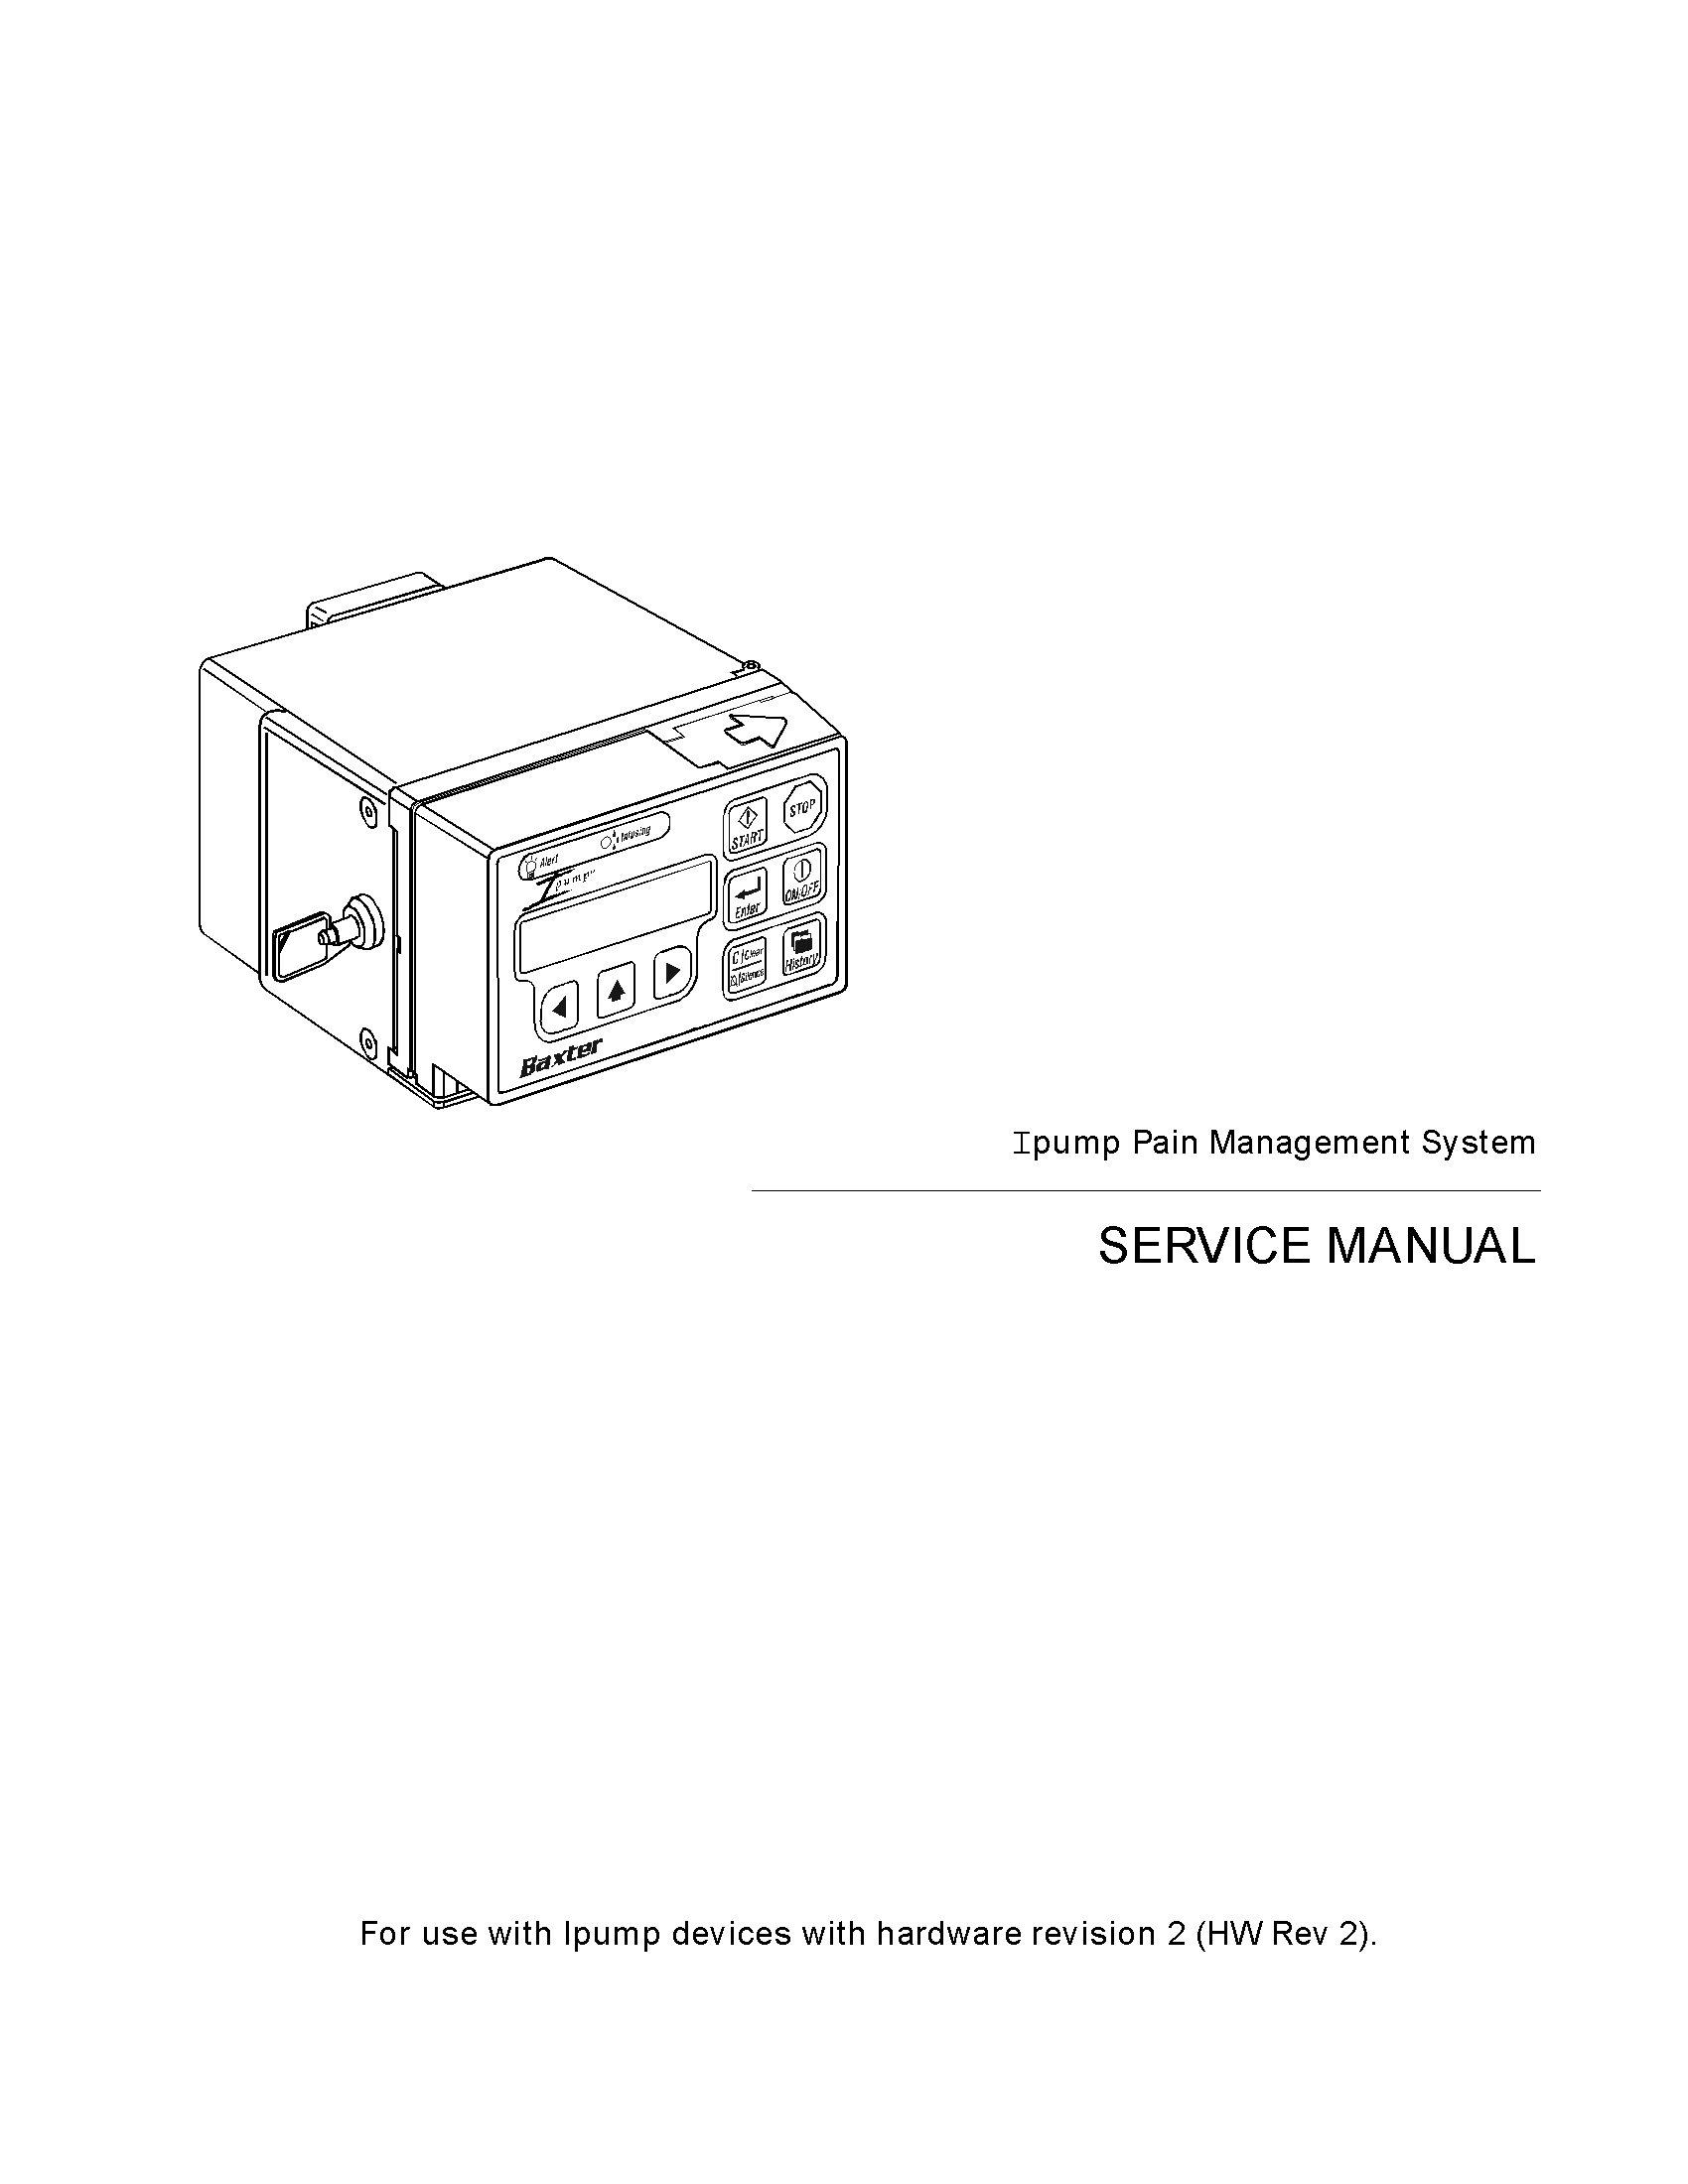 Baxter IPump Pain Management Service manual